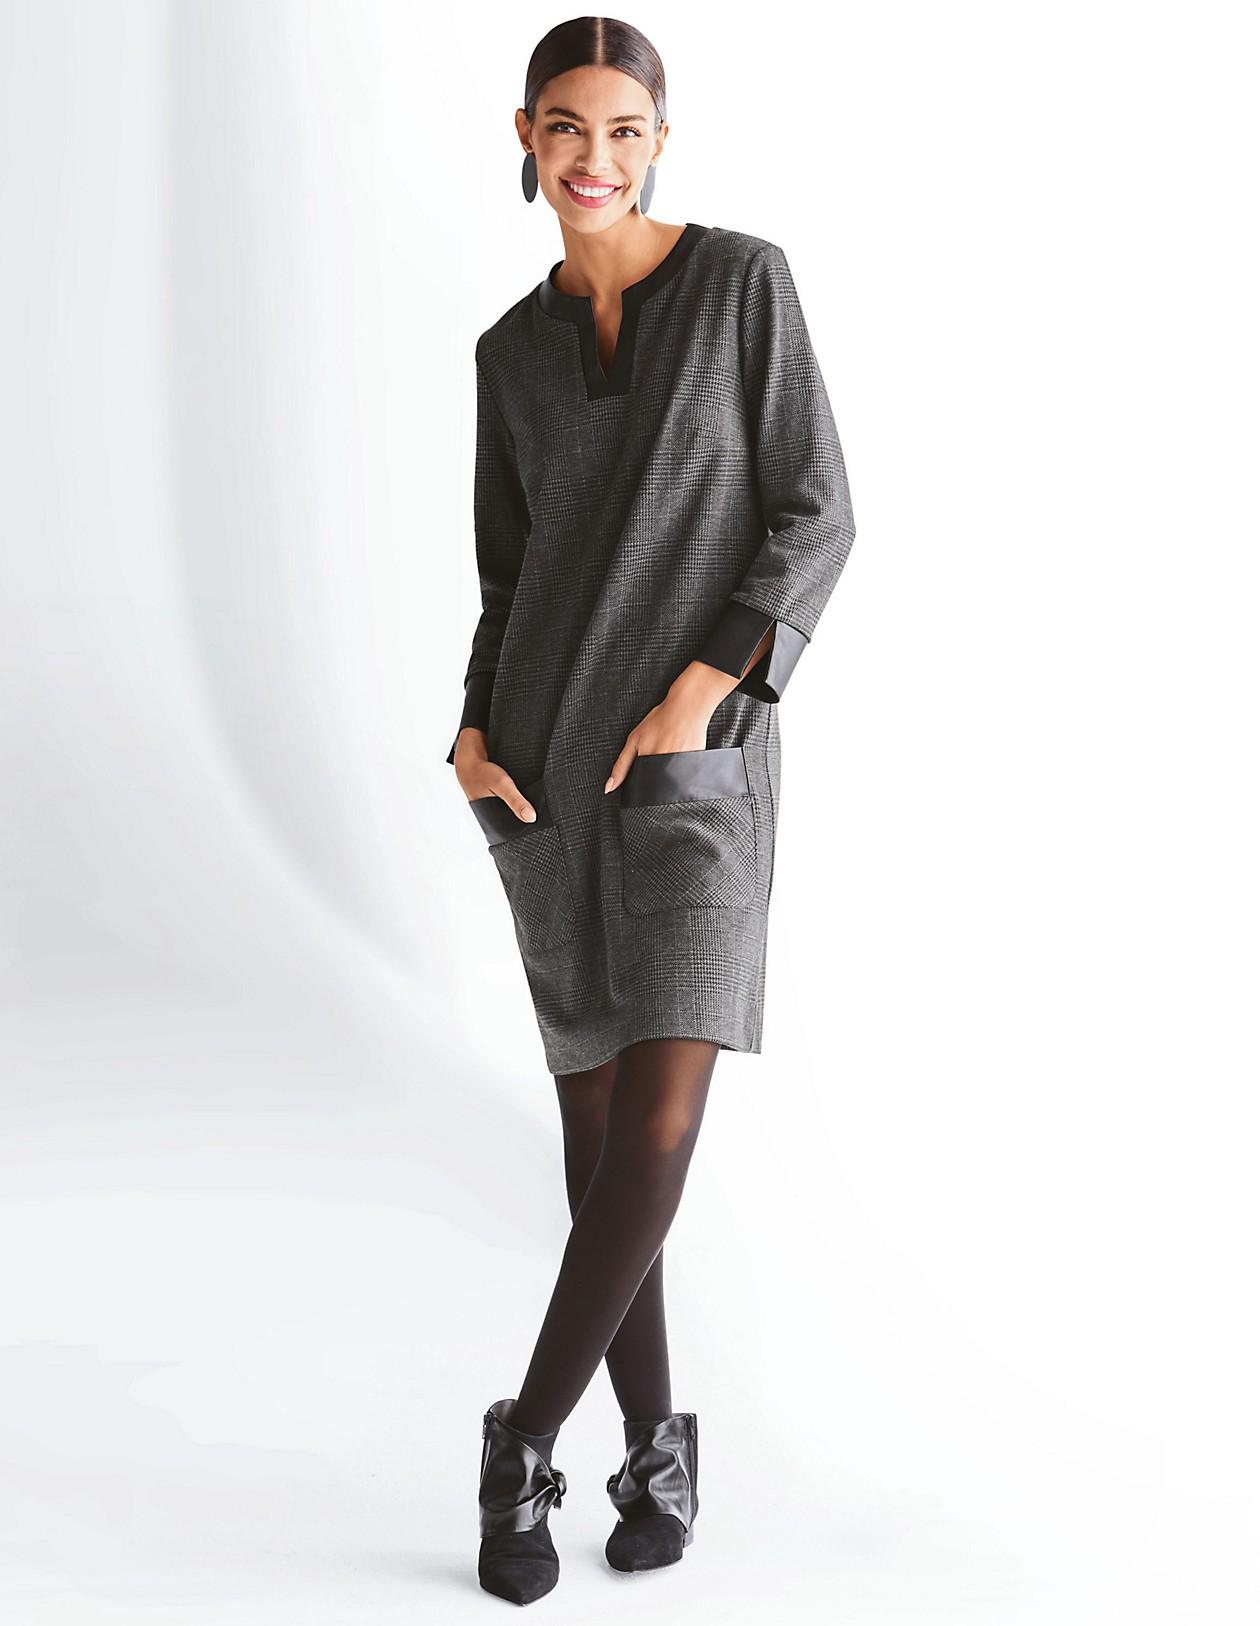 kleid in h-linie, schwarz/dunkelgrau, grau, schwarz